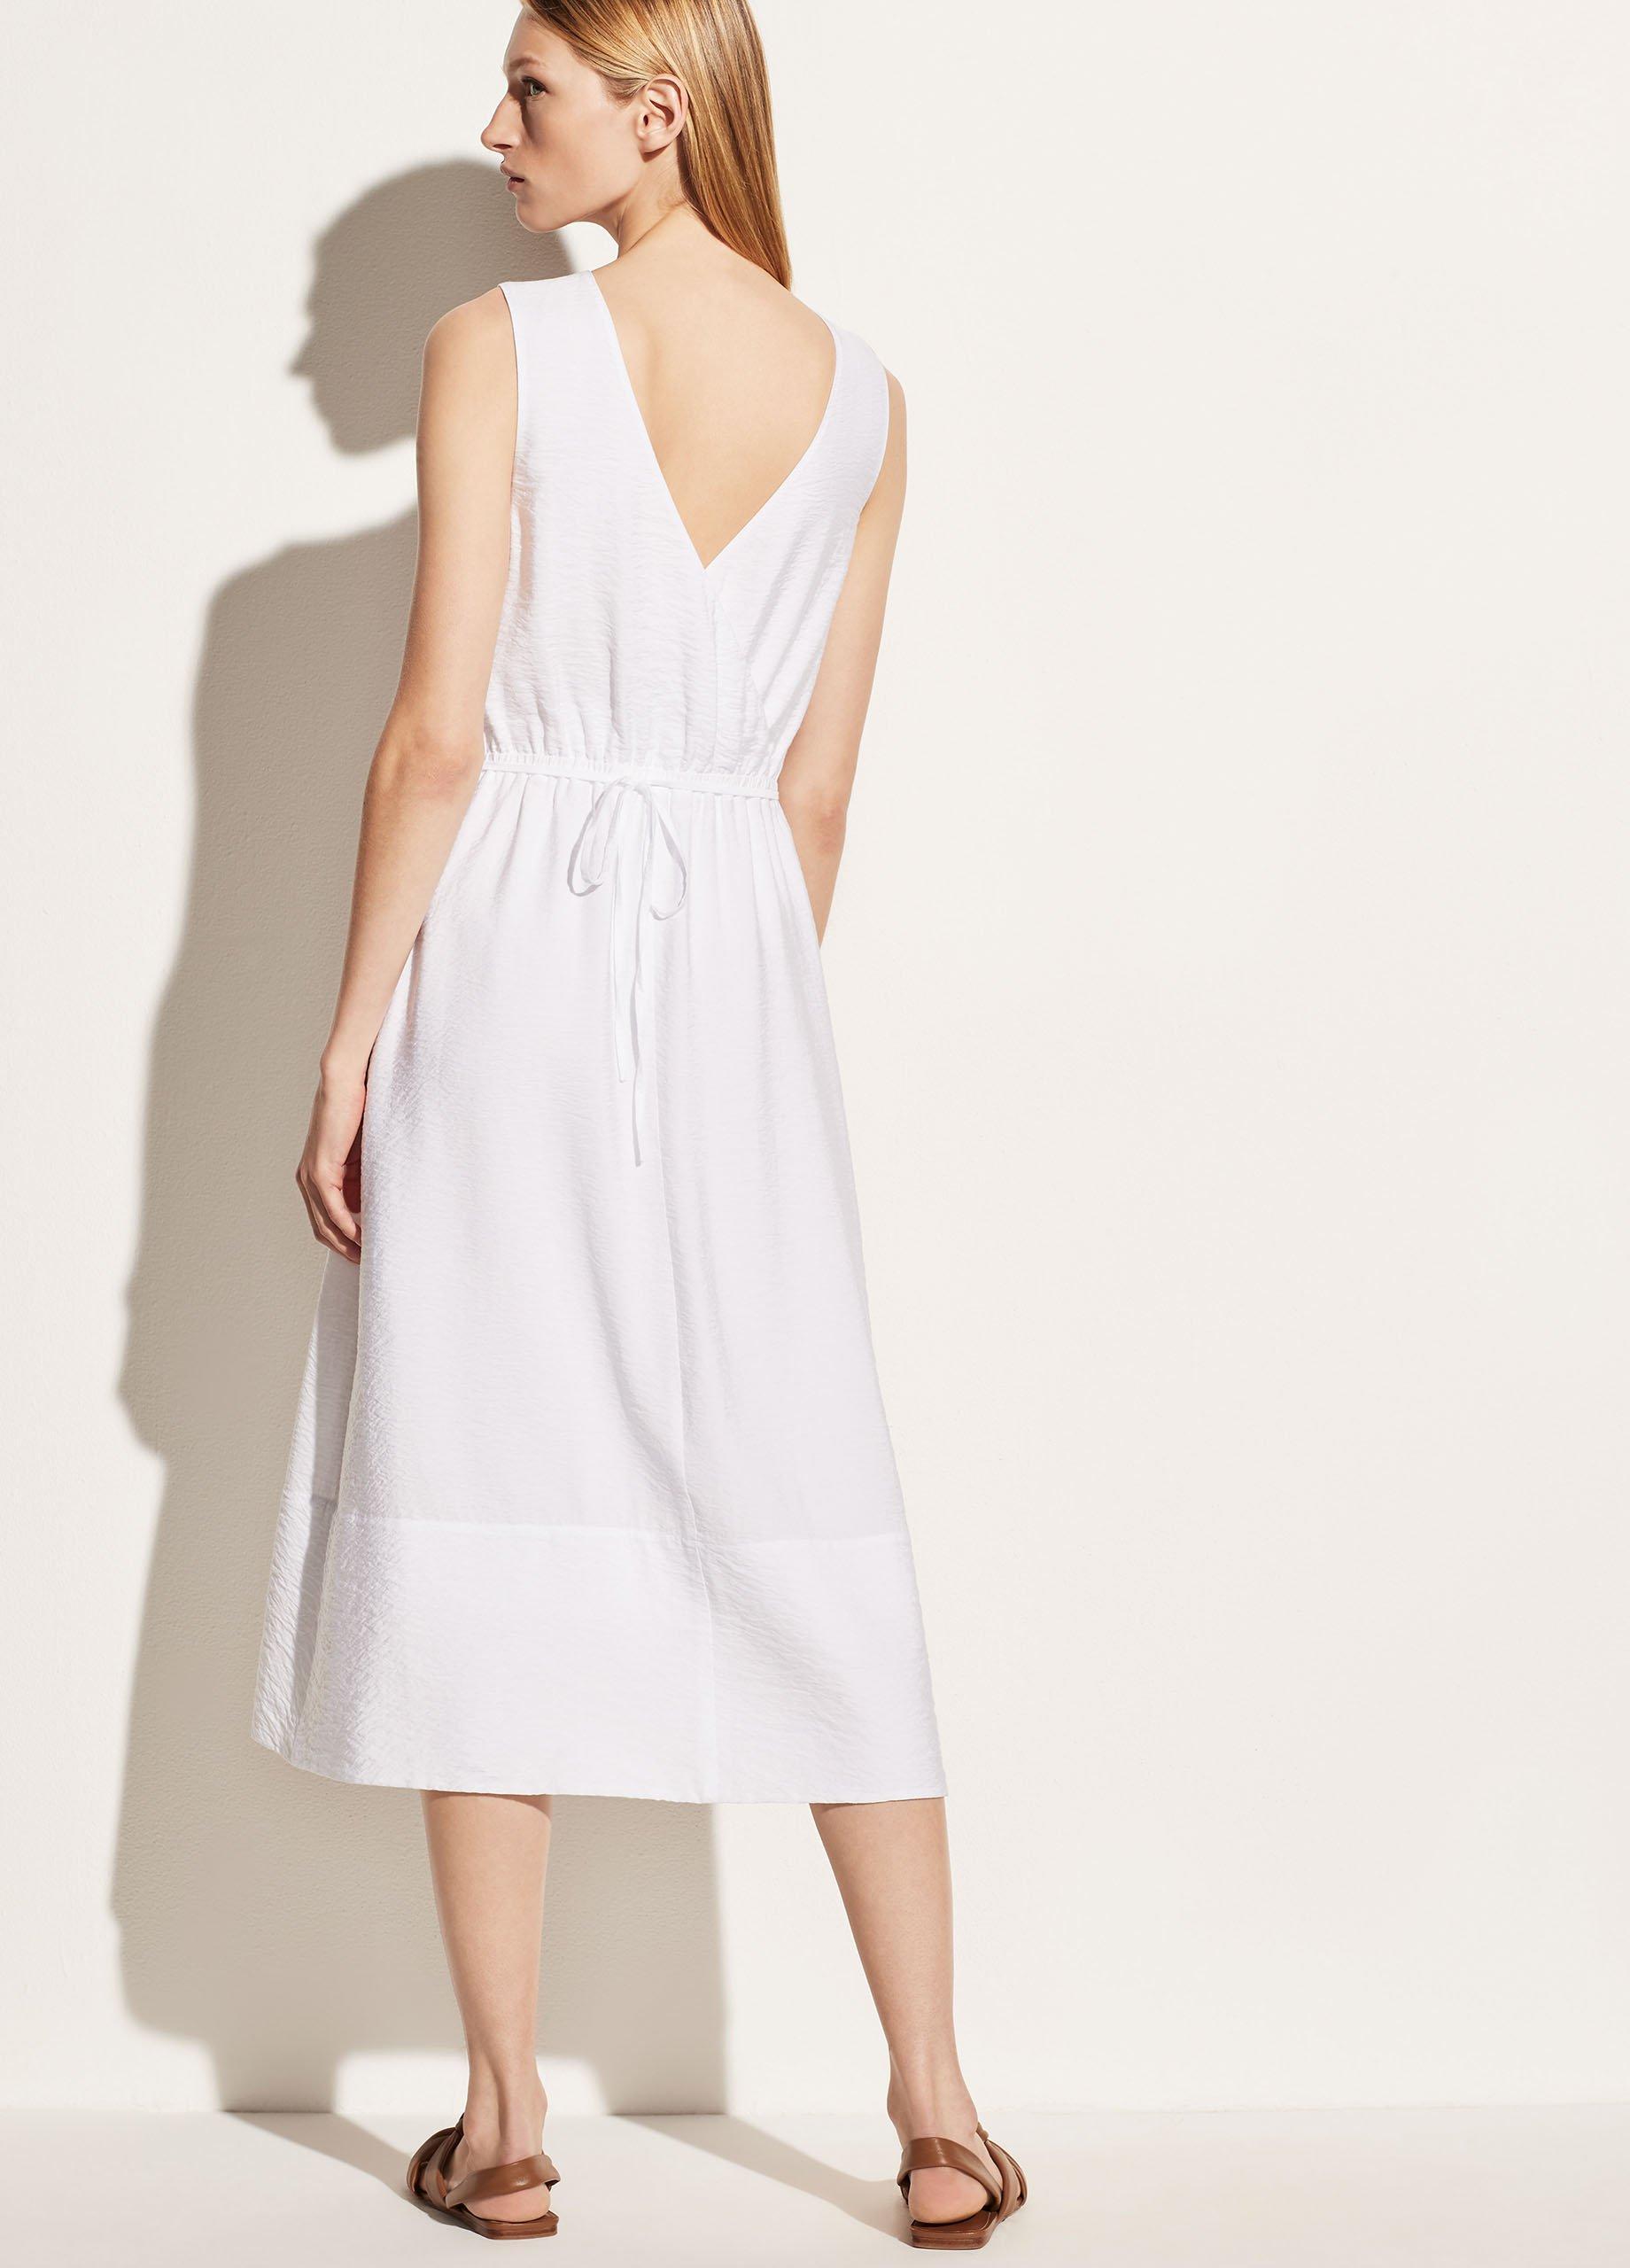 Sleeveless Cross Back Dress